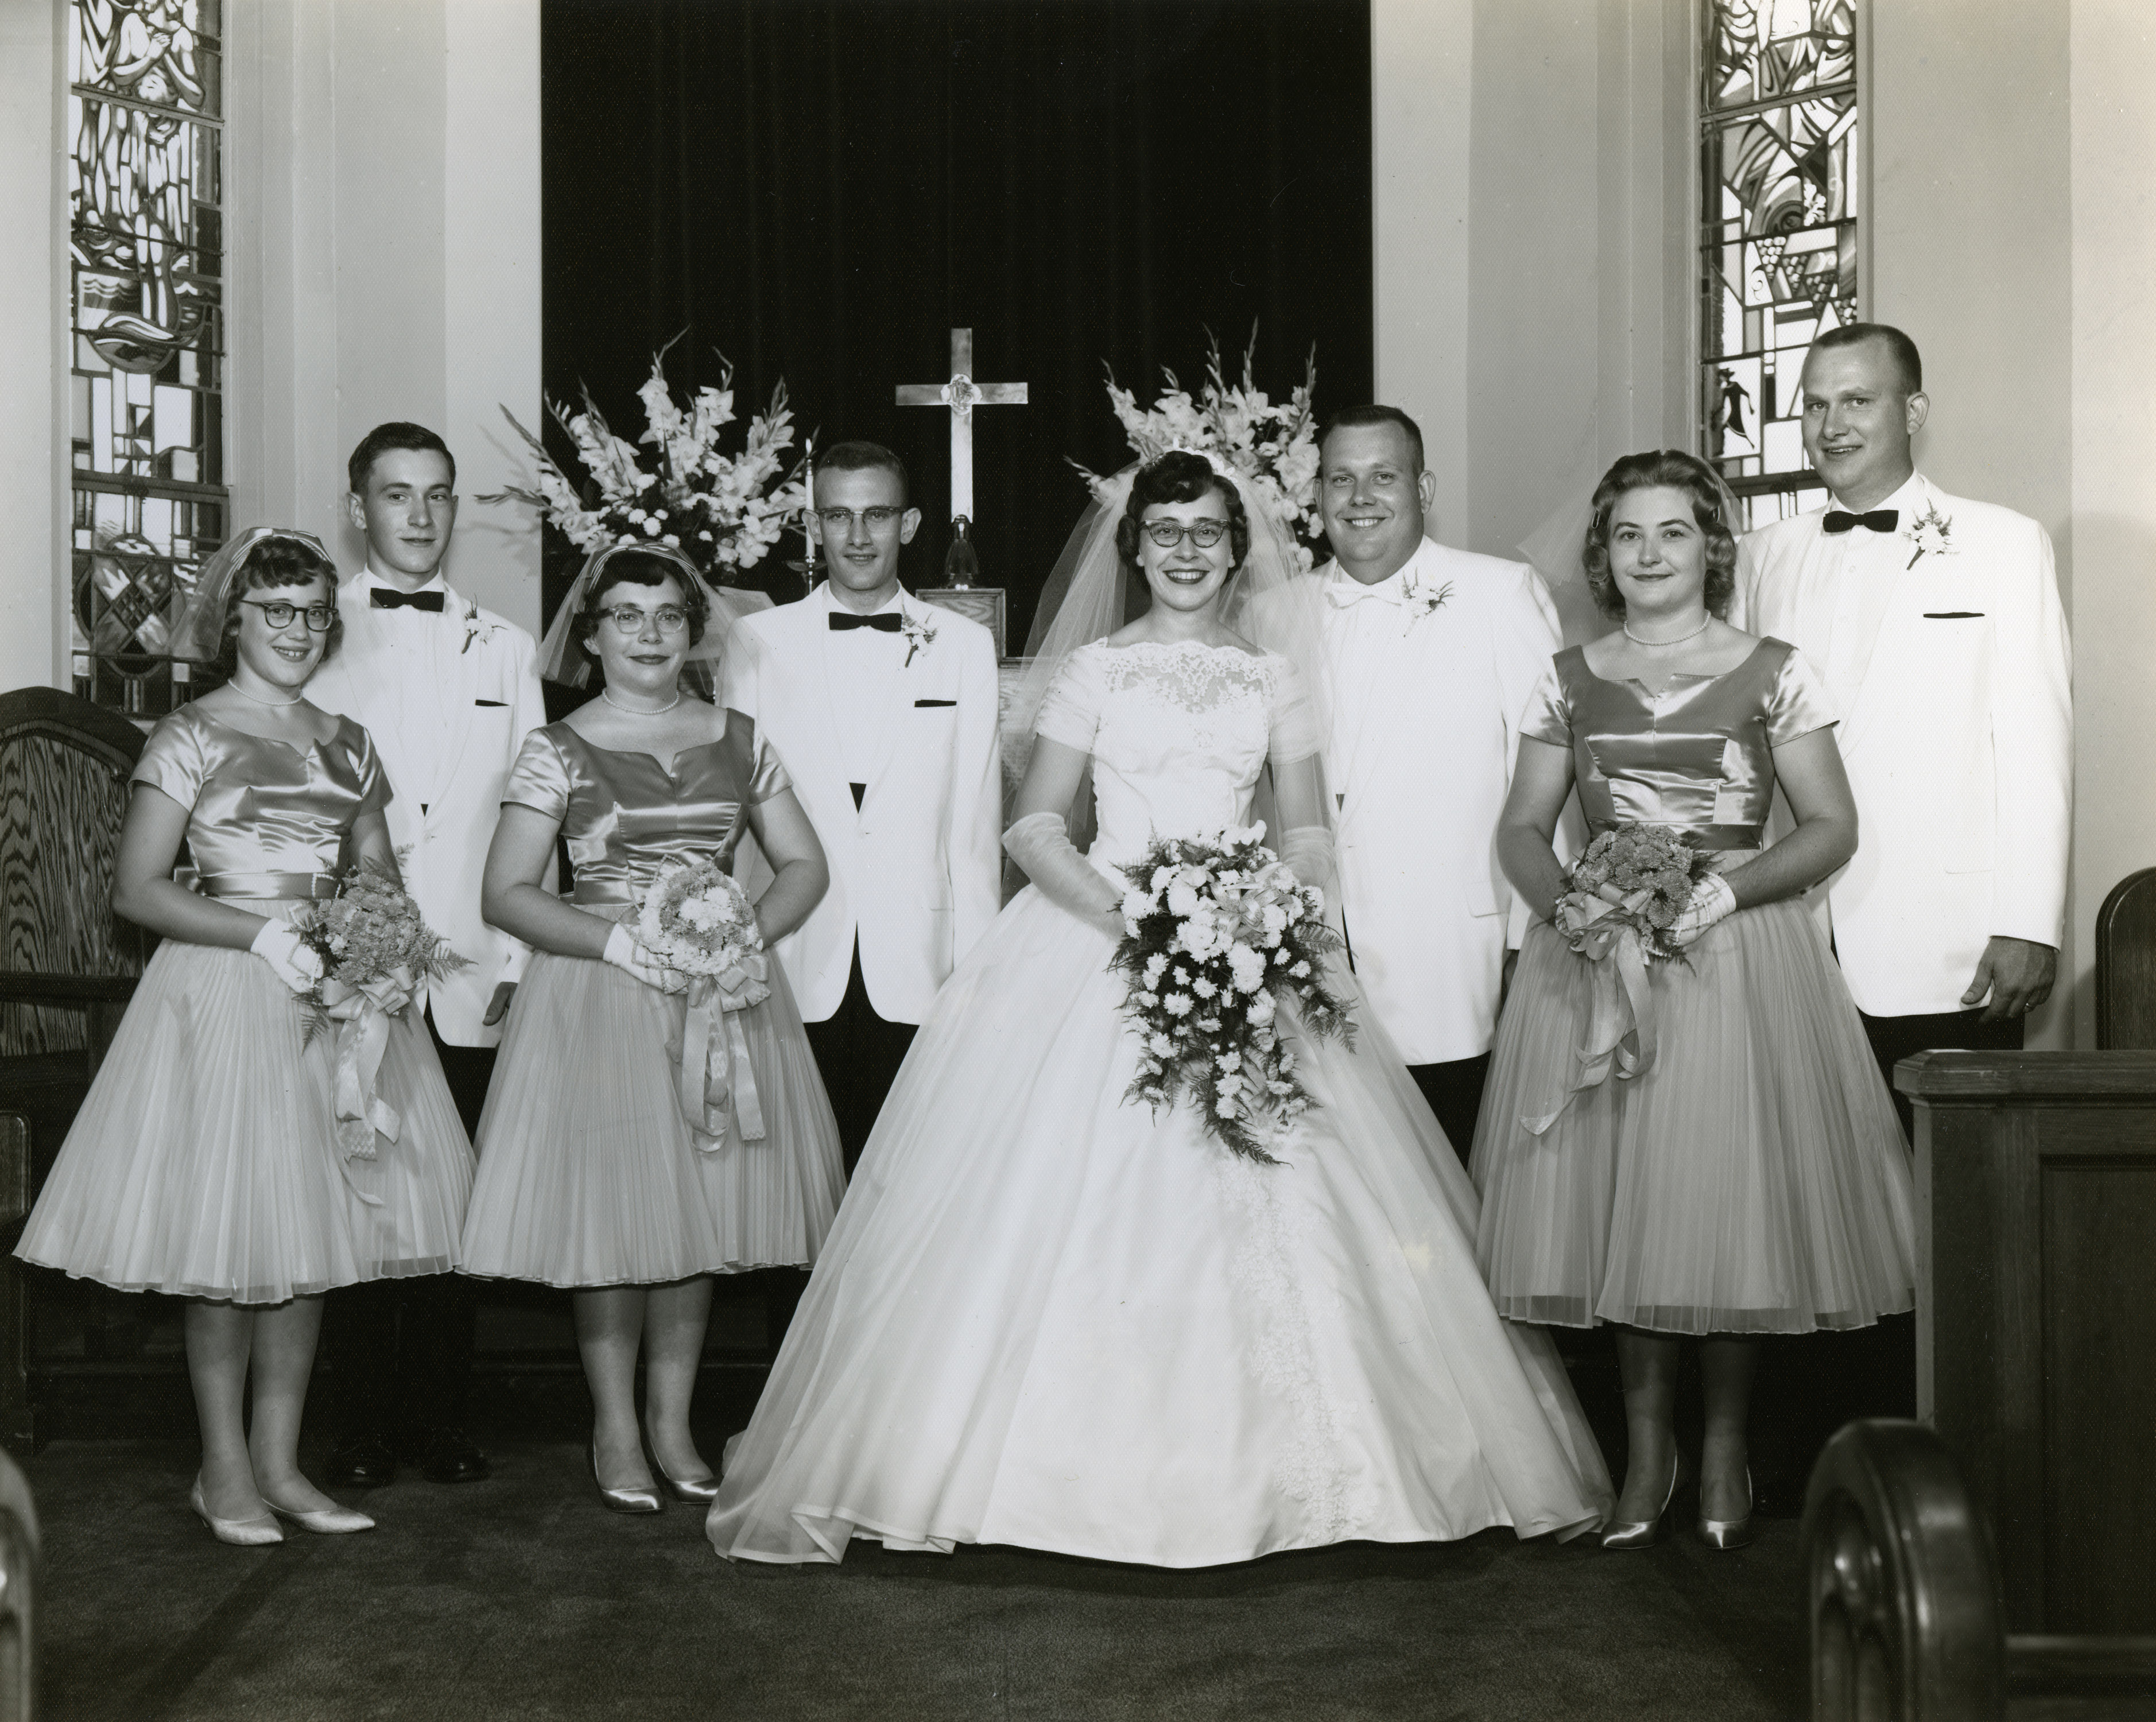 Wedding dresses: 50th wedding anniversary dresses for family